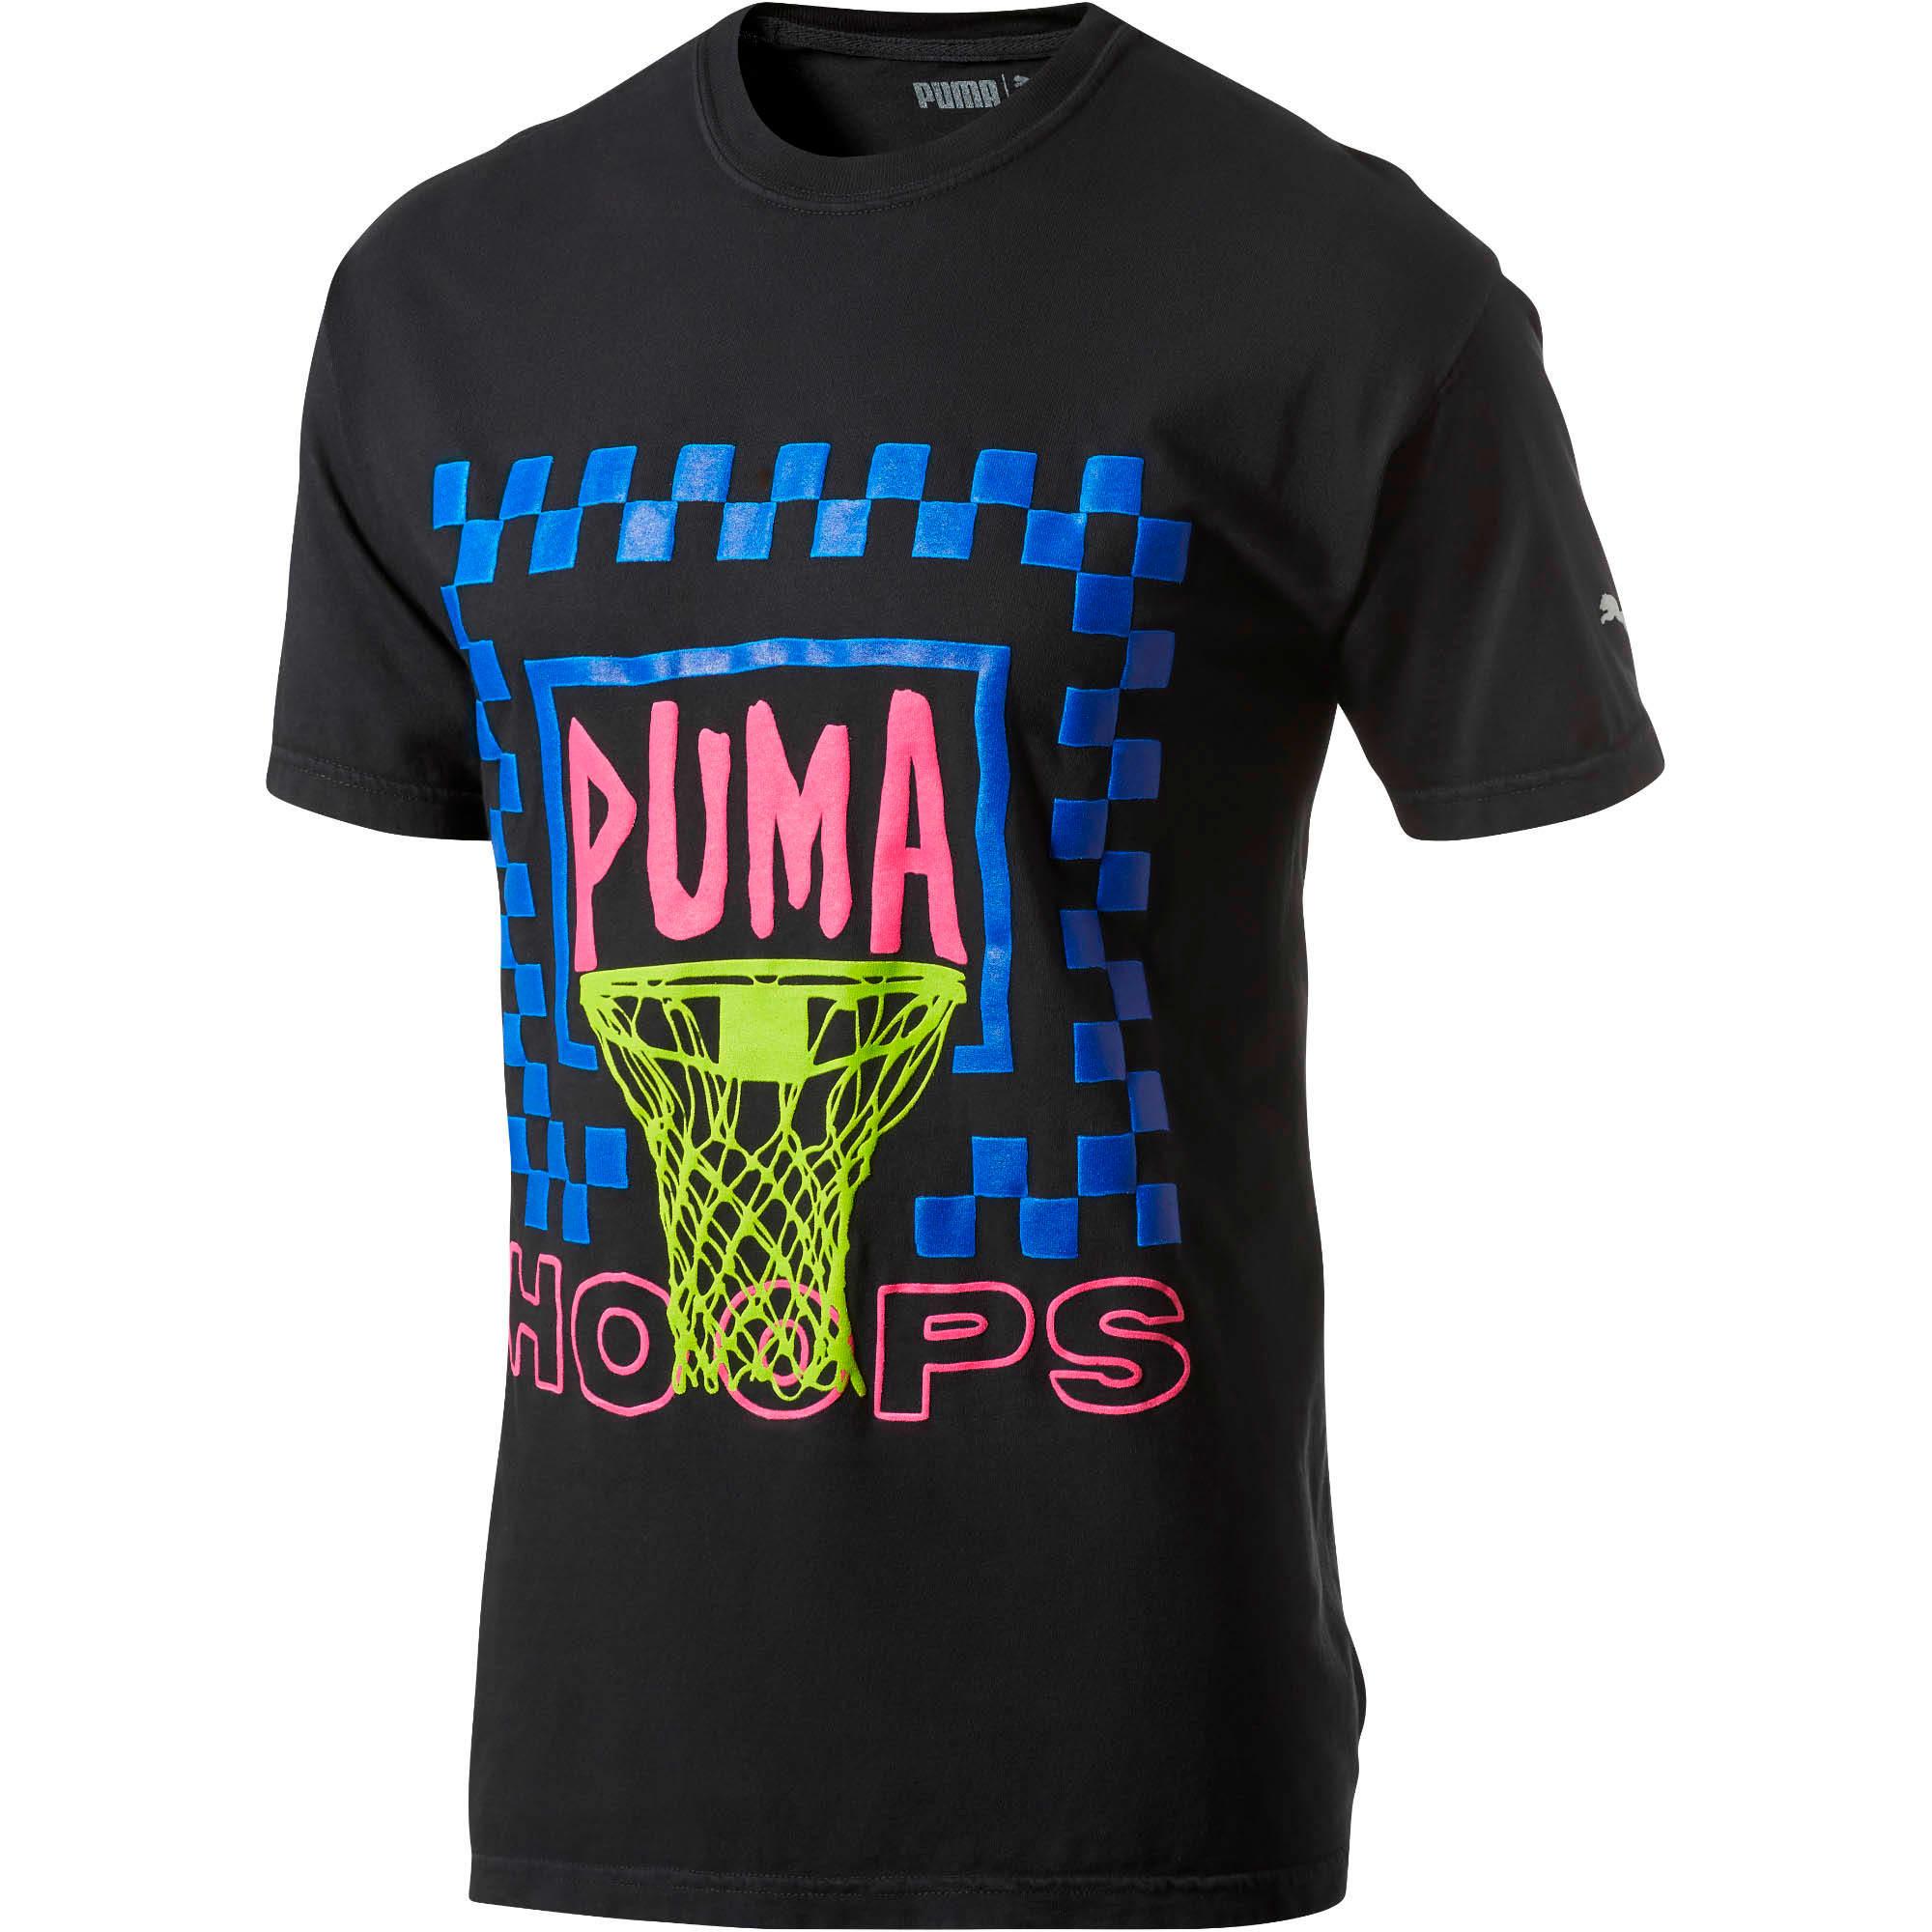 Miniatura 1 de Camiseta PUMA x CHINATOWN MARKET Summertime, Negro, mediano